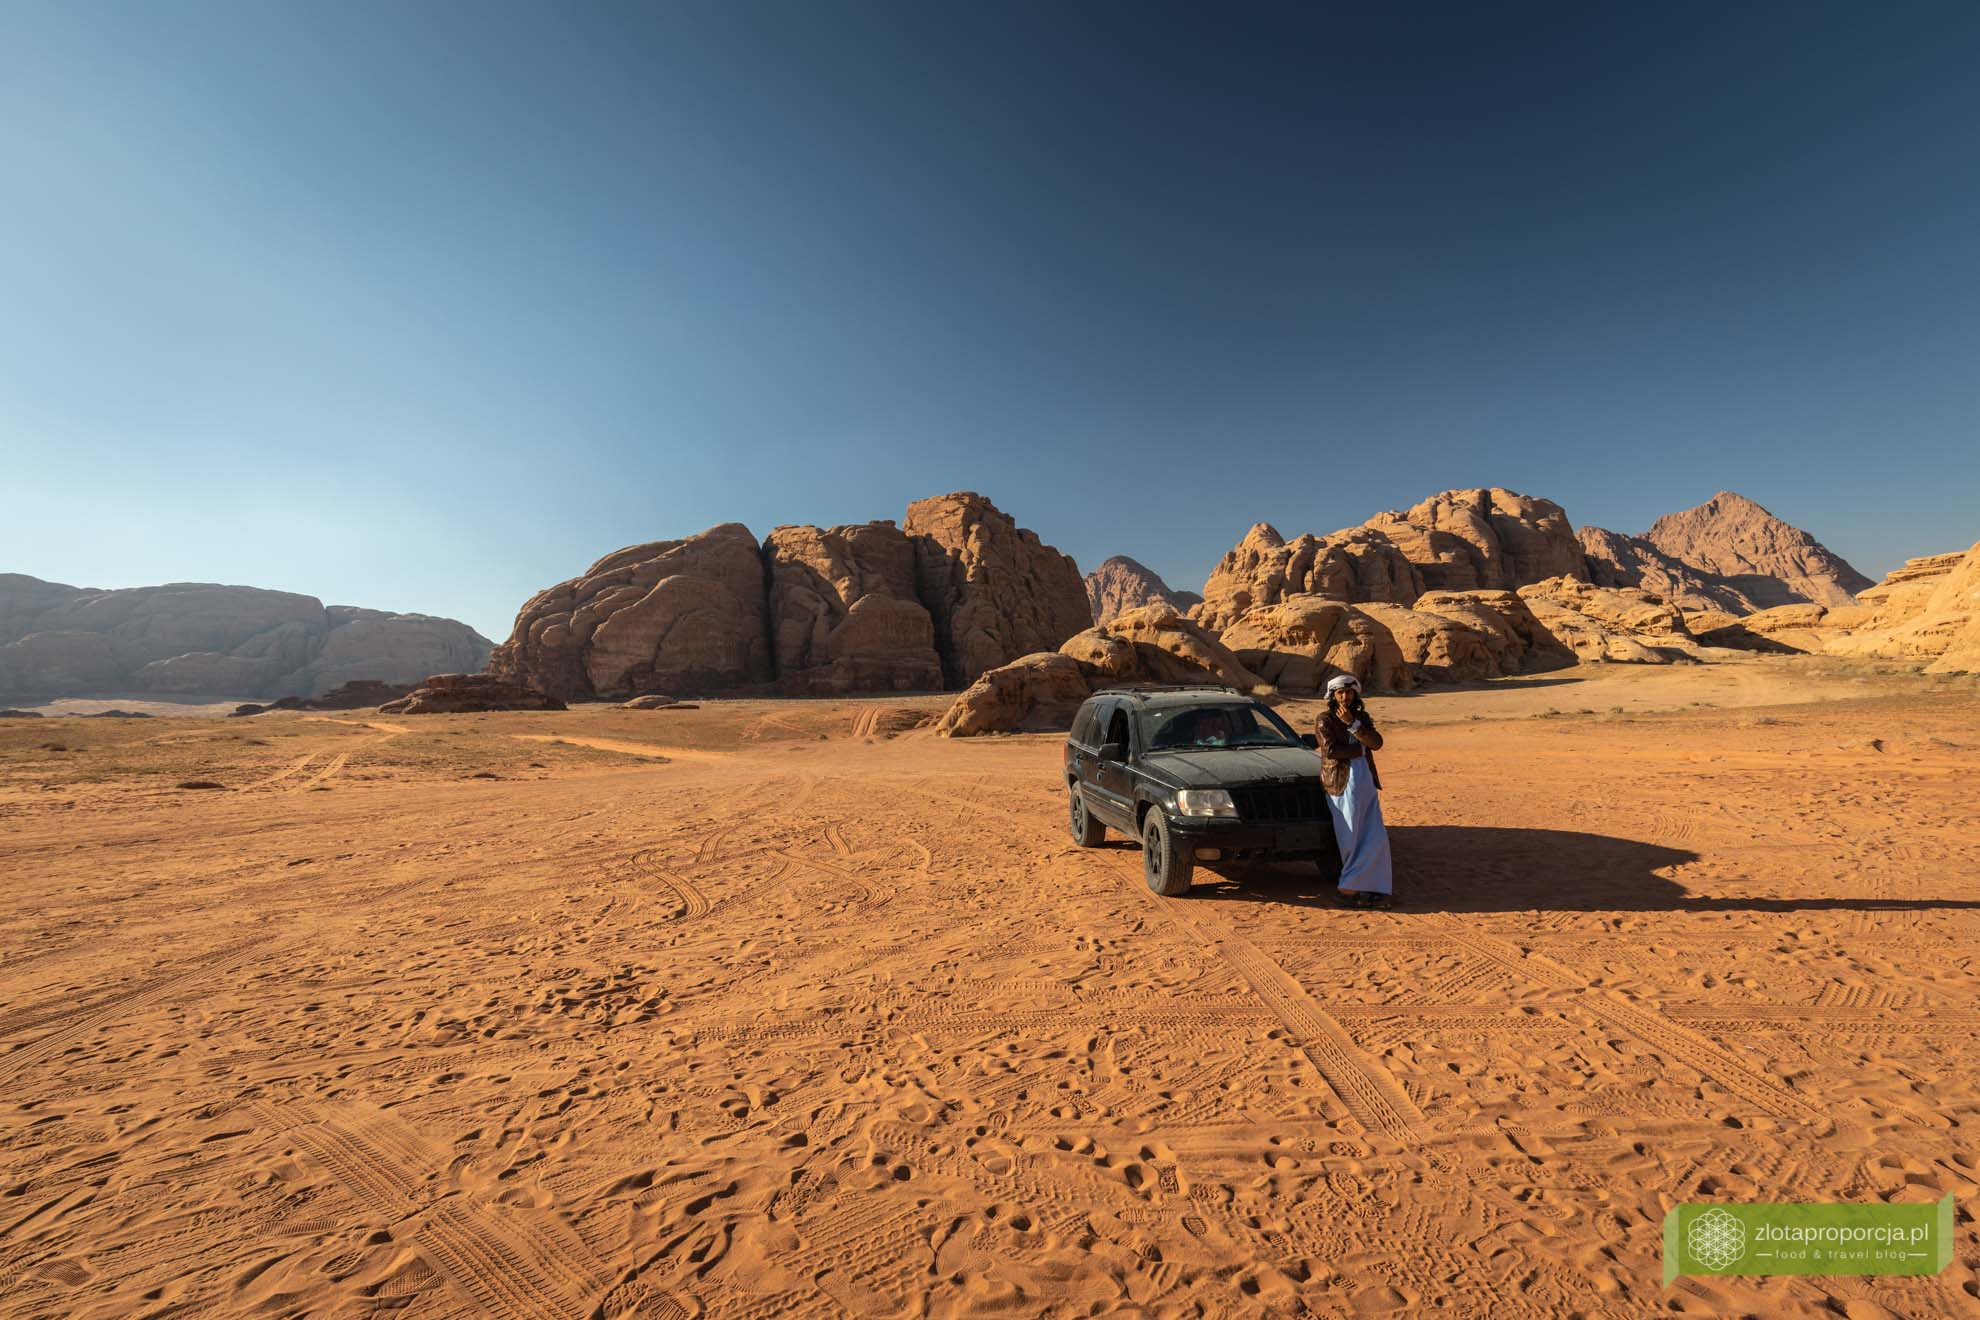 Wadi Rum, pustynia Wadi Rum, Jordania, pustynia Jordania; Wadi rum wycieczka, Wadi Rum zwiedzanie, Jordania atrakcje; Beduini, herbata po beduińsku;